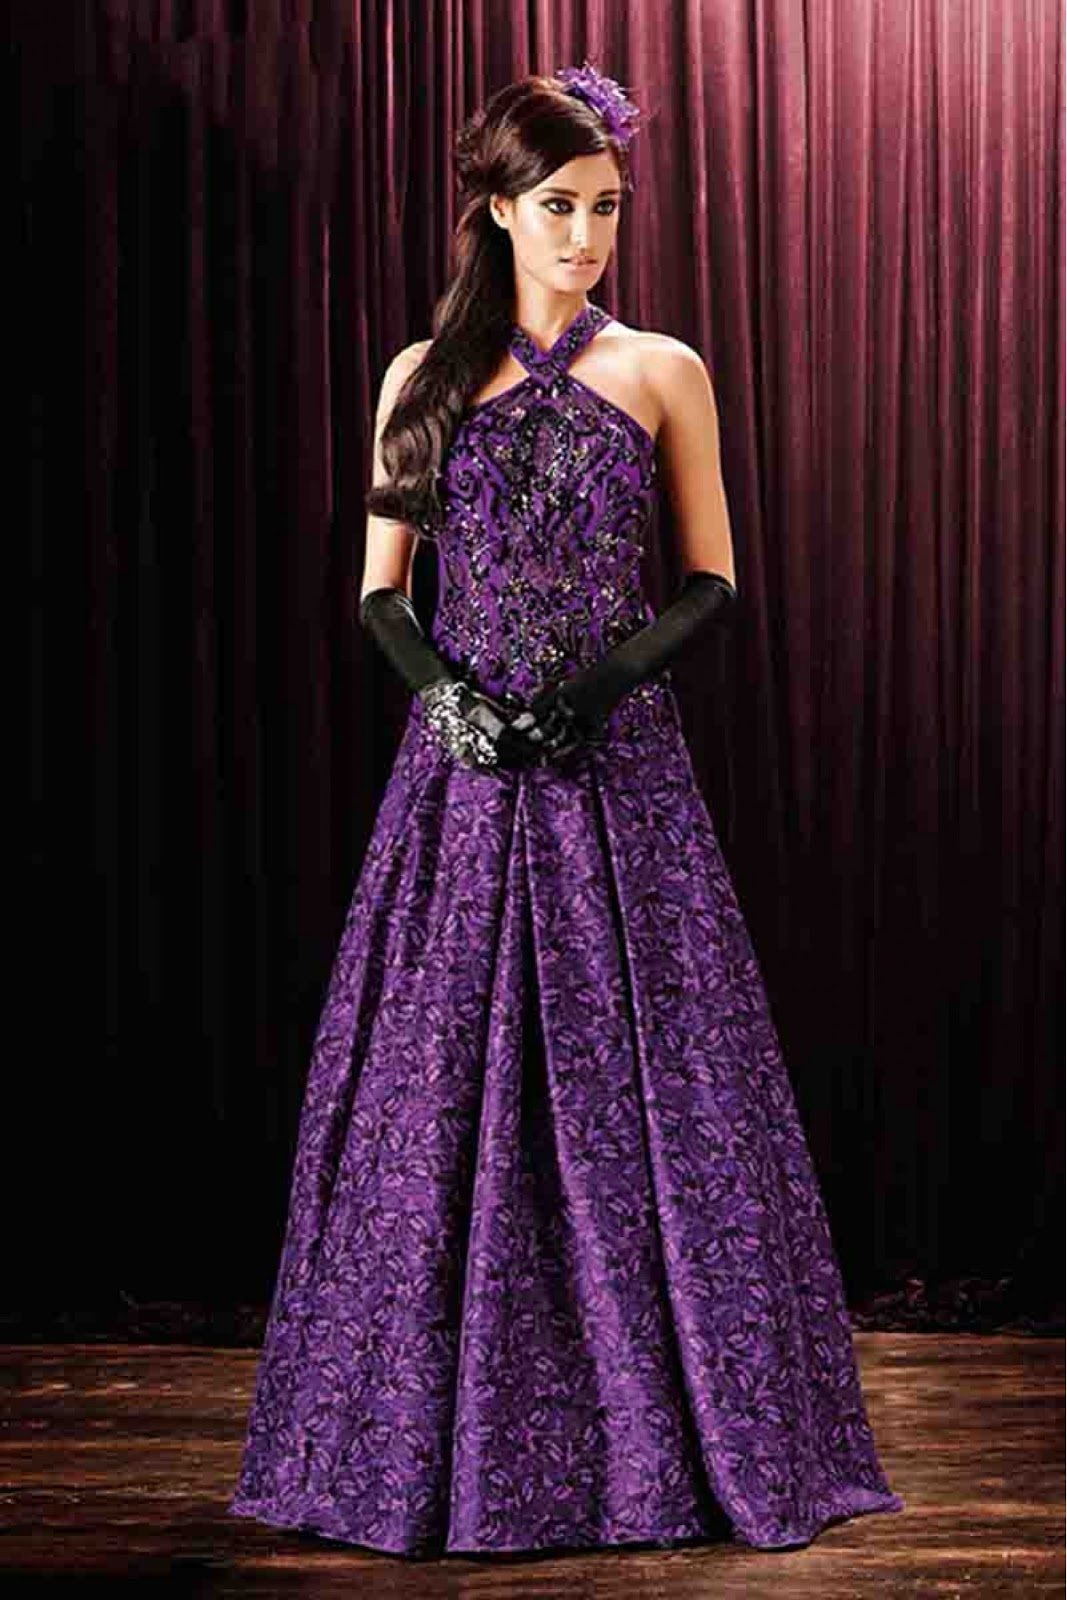 Latest Collection Online: Buy Online Designer wedding Gown